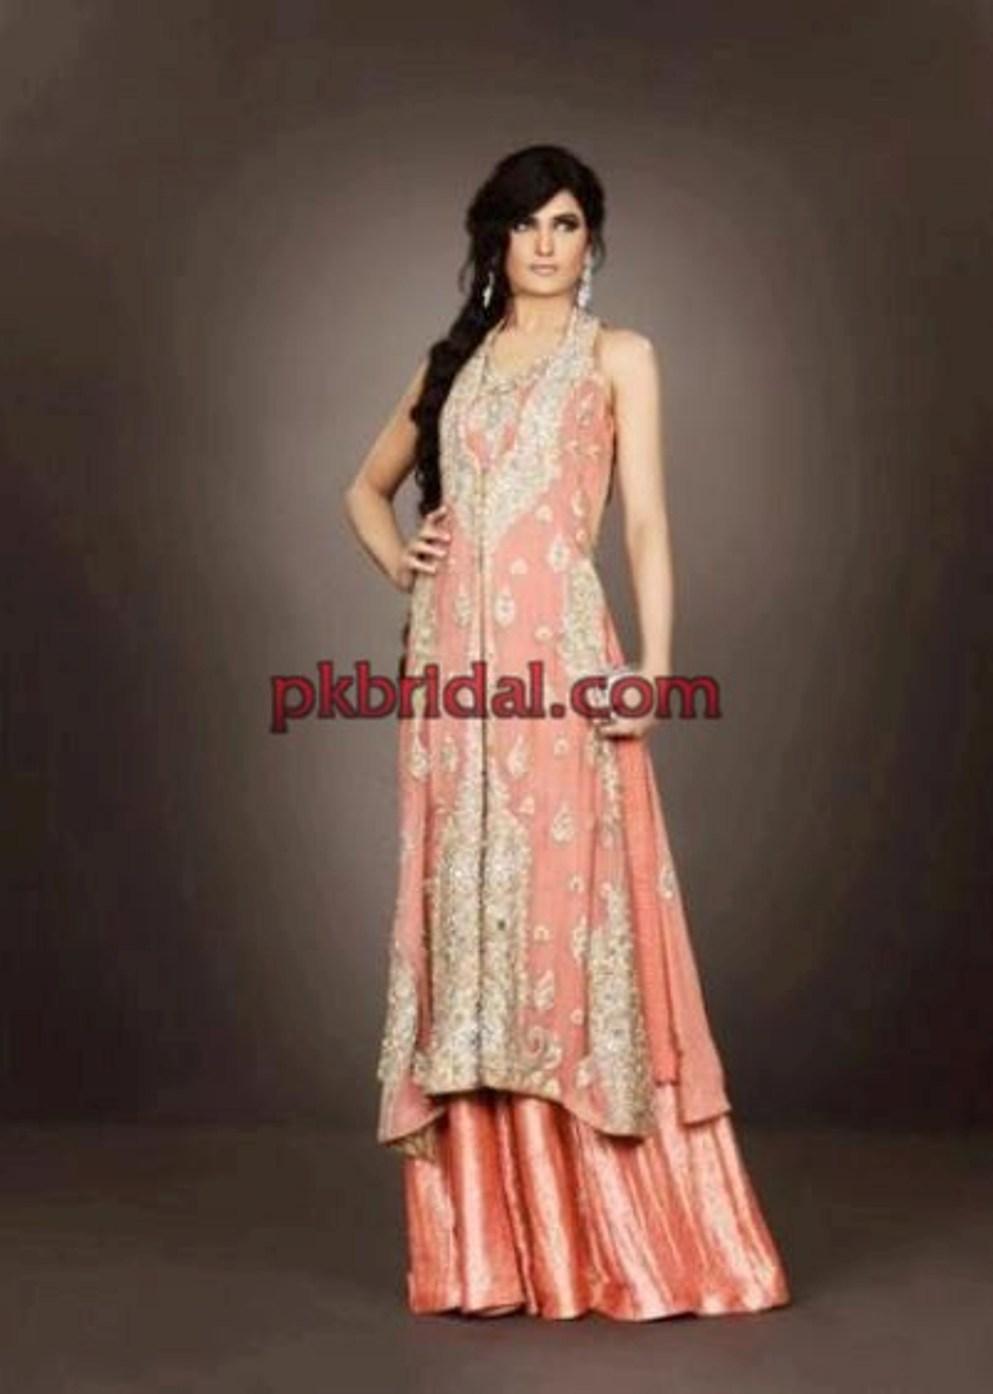 pakistani-partywear-146